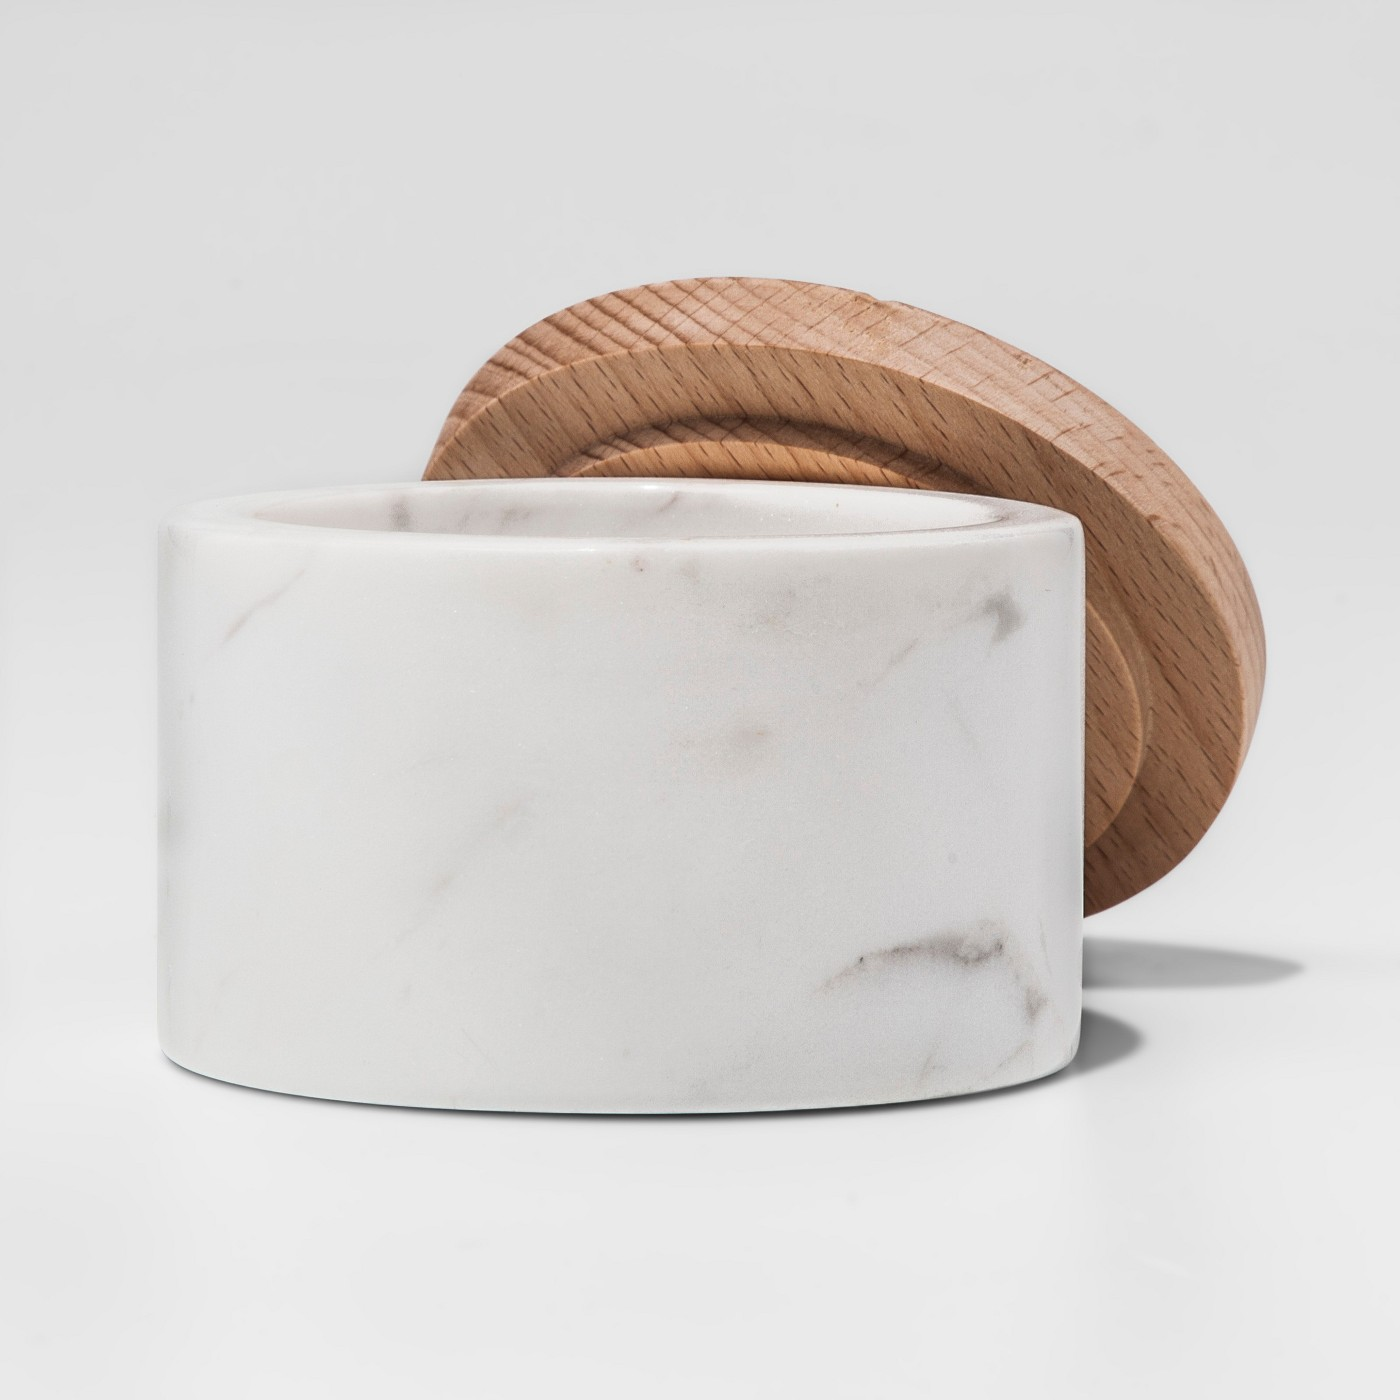 Marble Salt Box with Beechwood Lid White - Threshold⢠- image 2 of 2